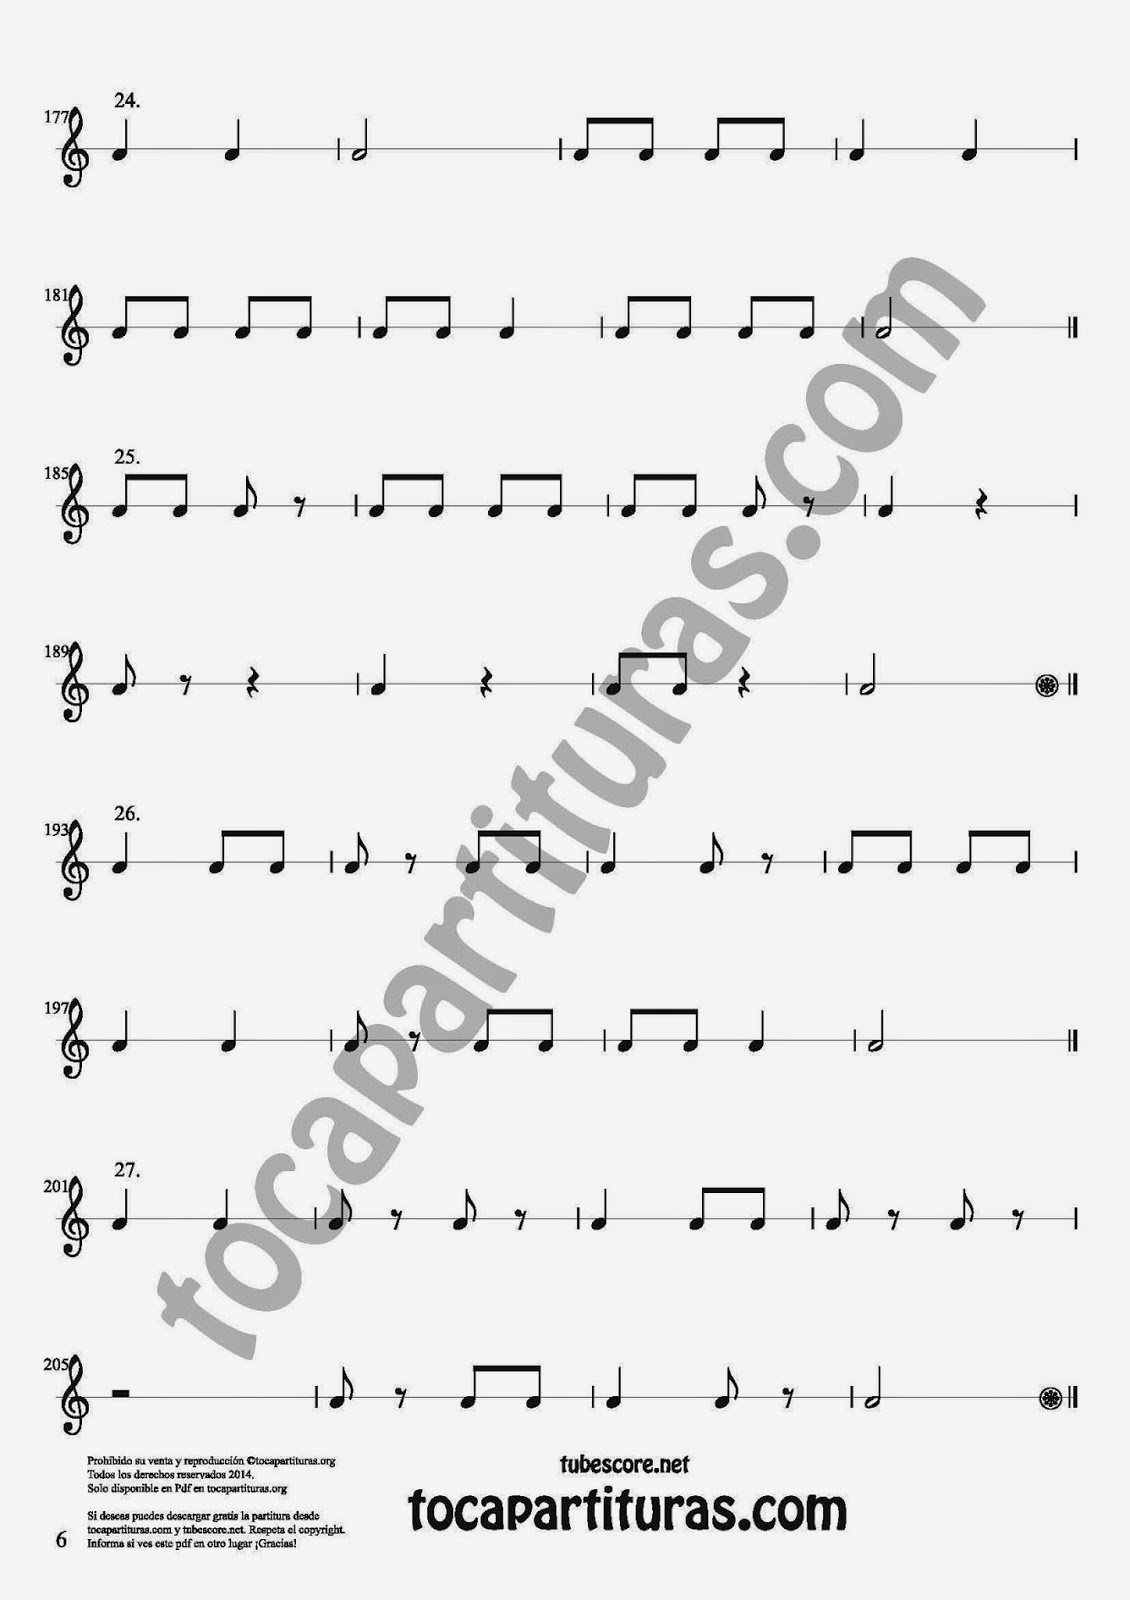 Ejercicios Ritmicos Para Guitarra 27 Ejercicios Rítmicos Para